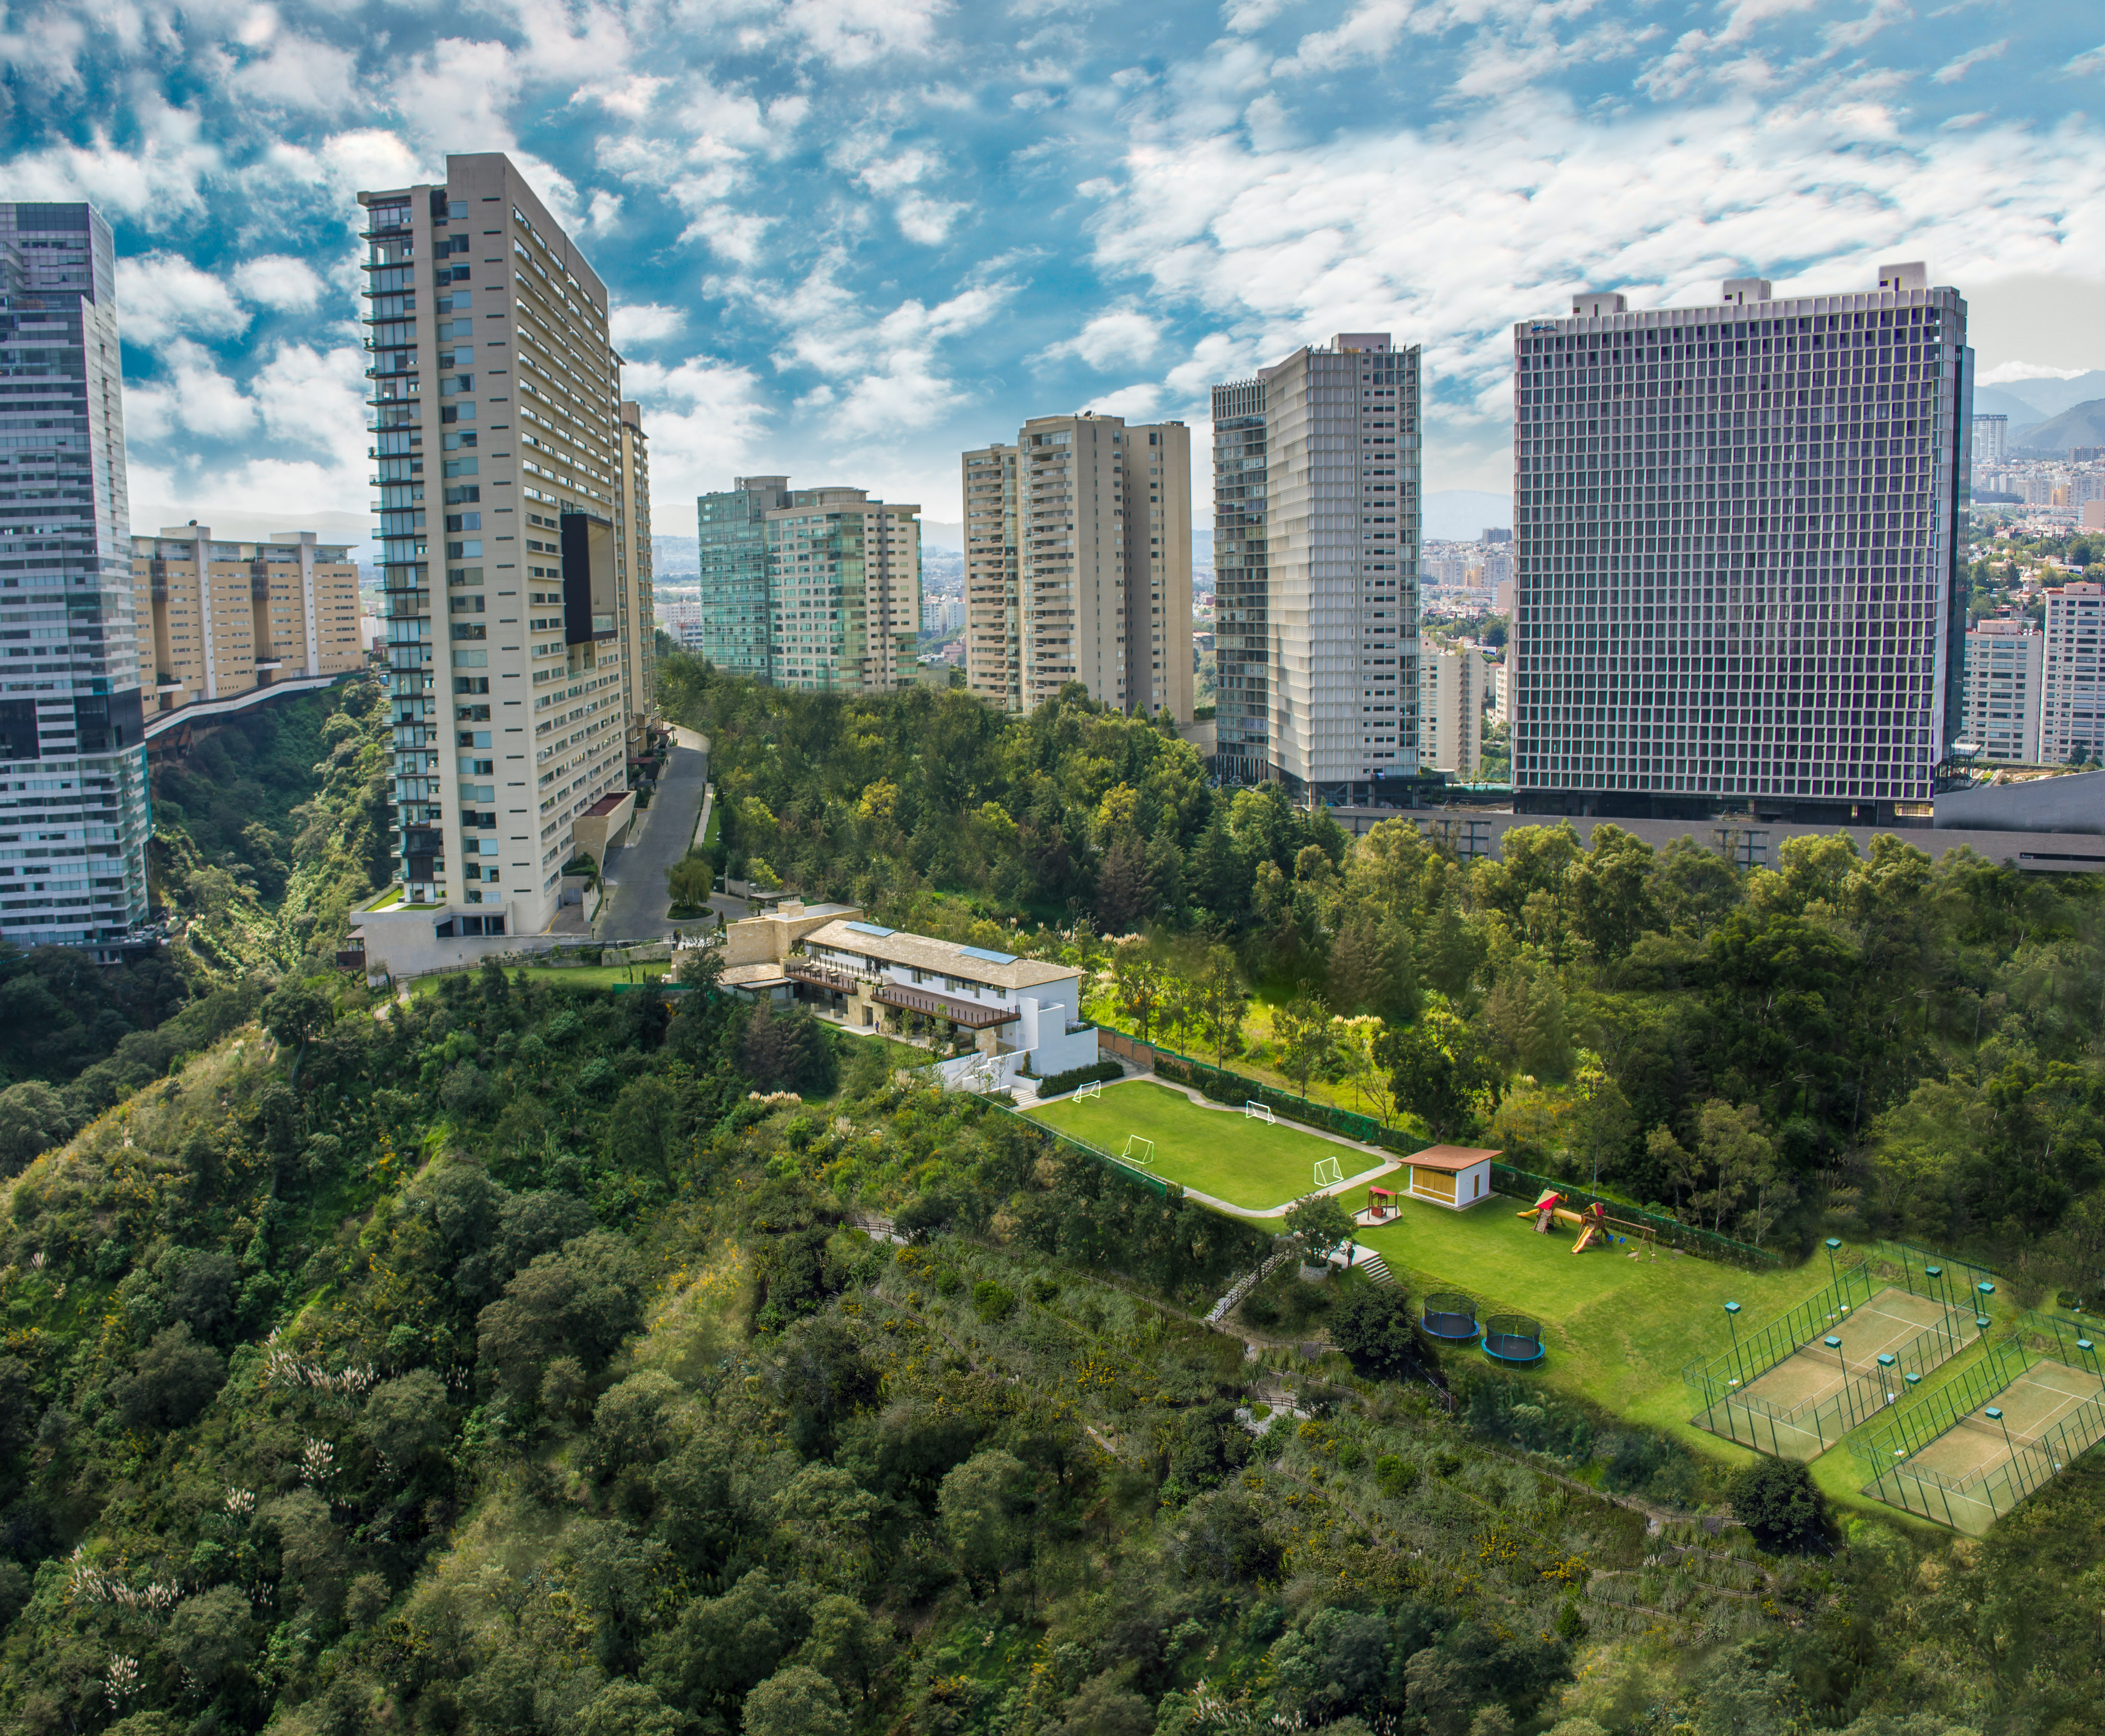 Fotografia aerea de residencial